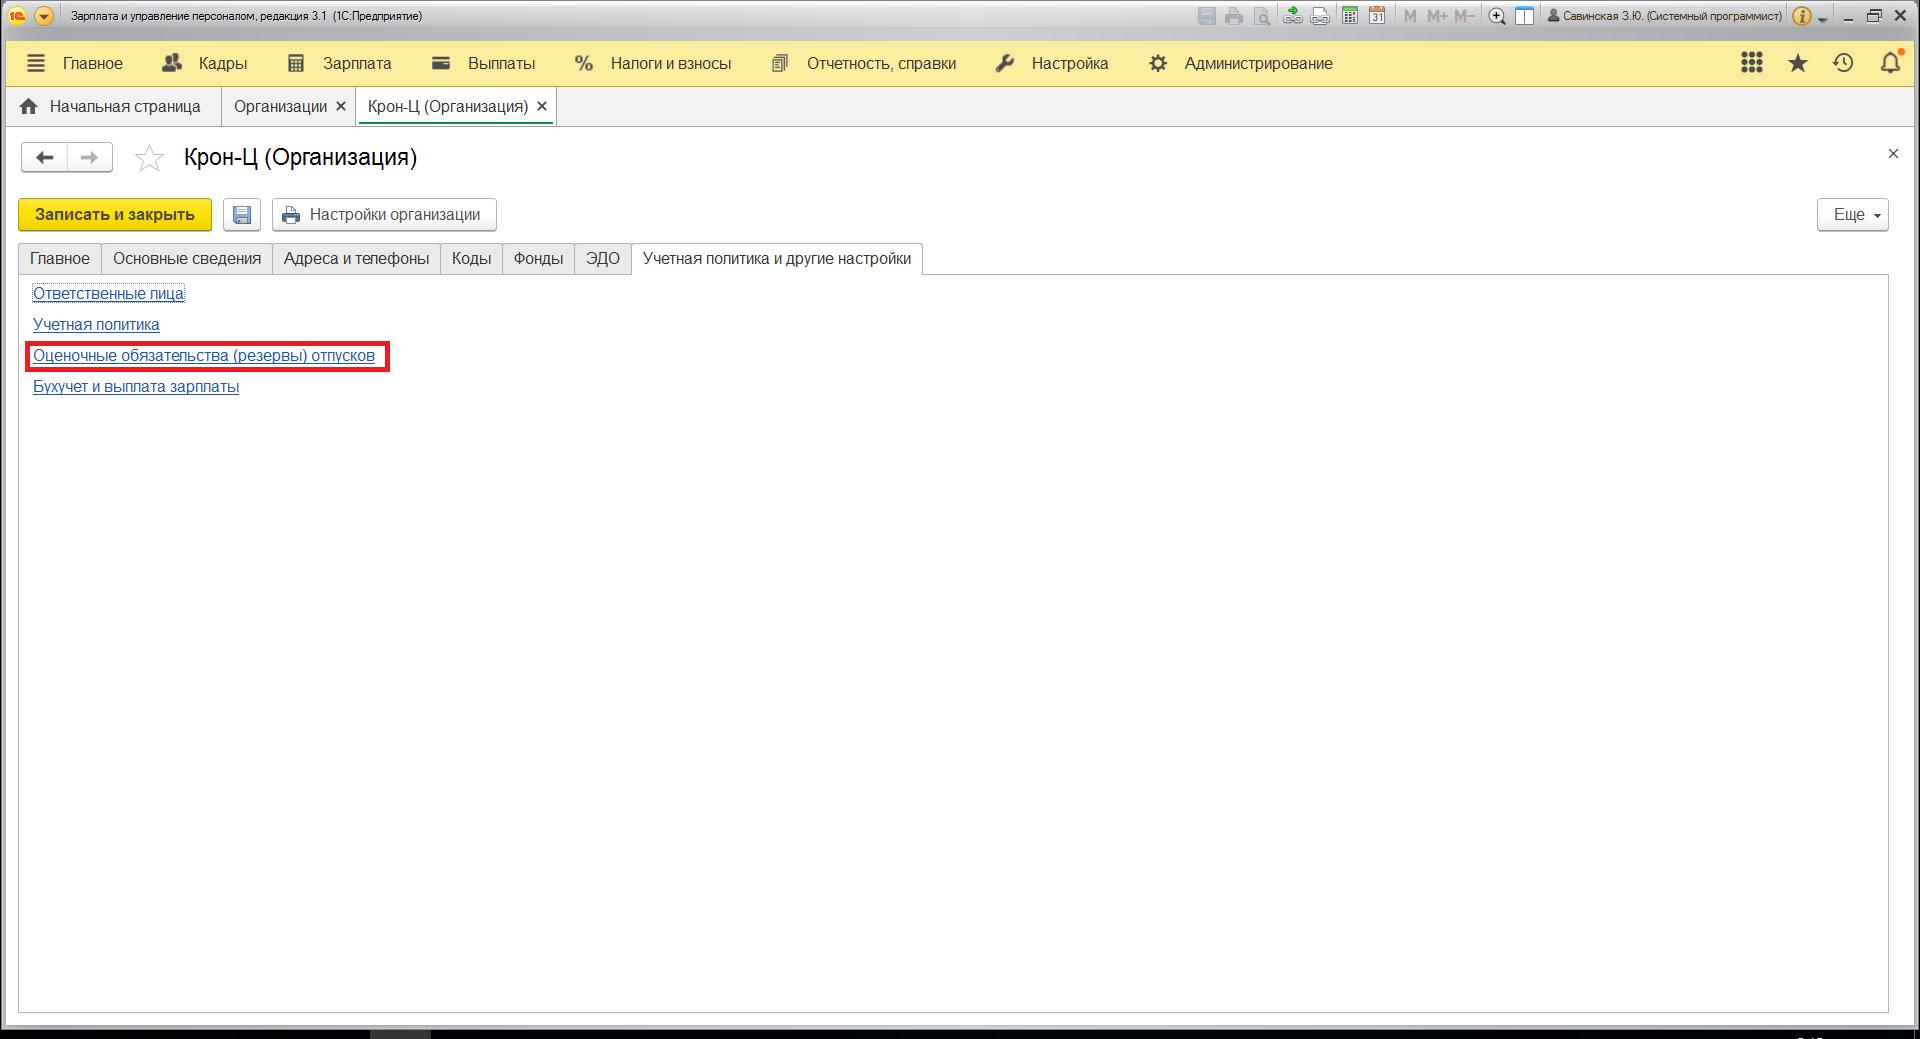 C:\Users\ACER\Desktop\Безымянный.png